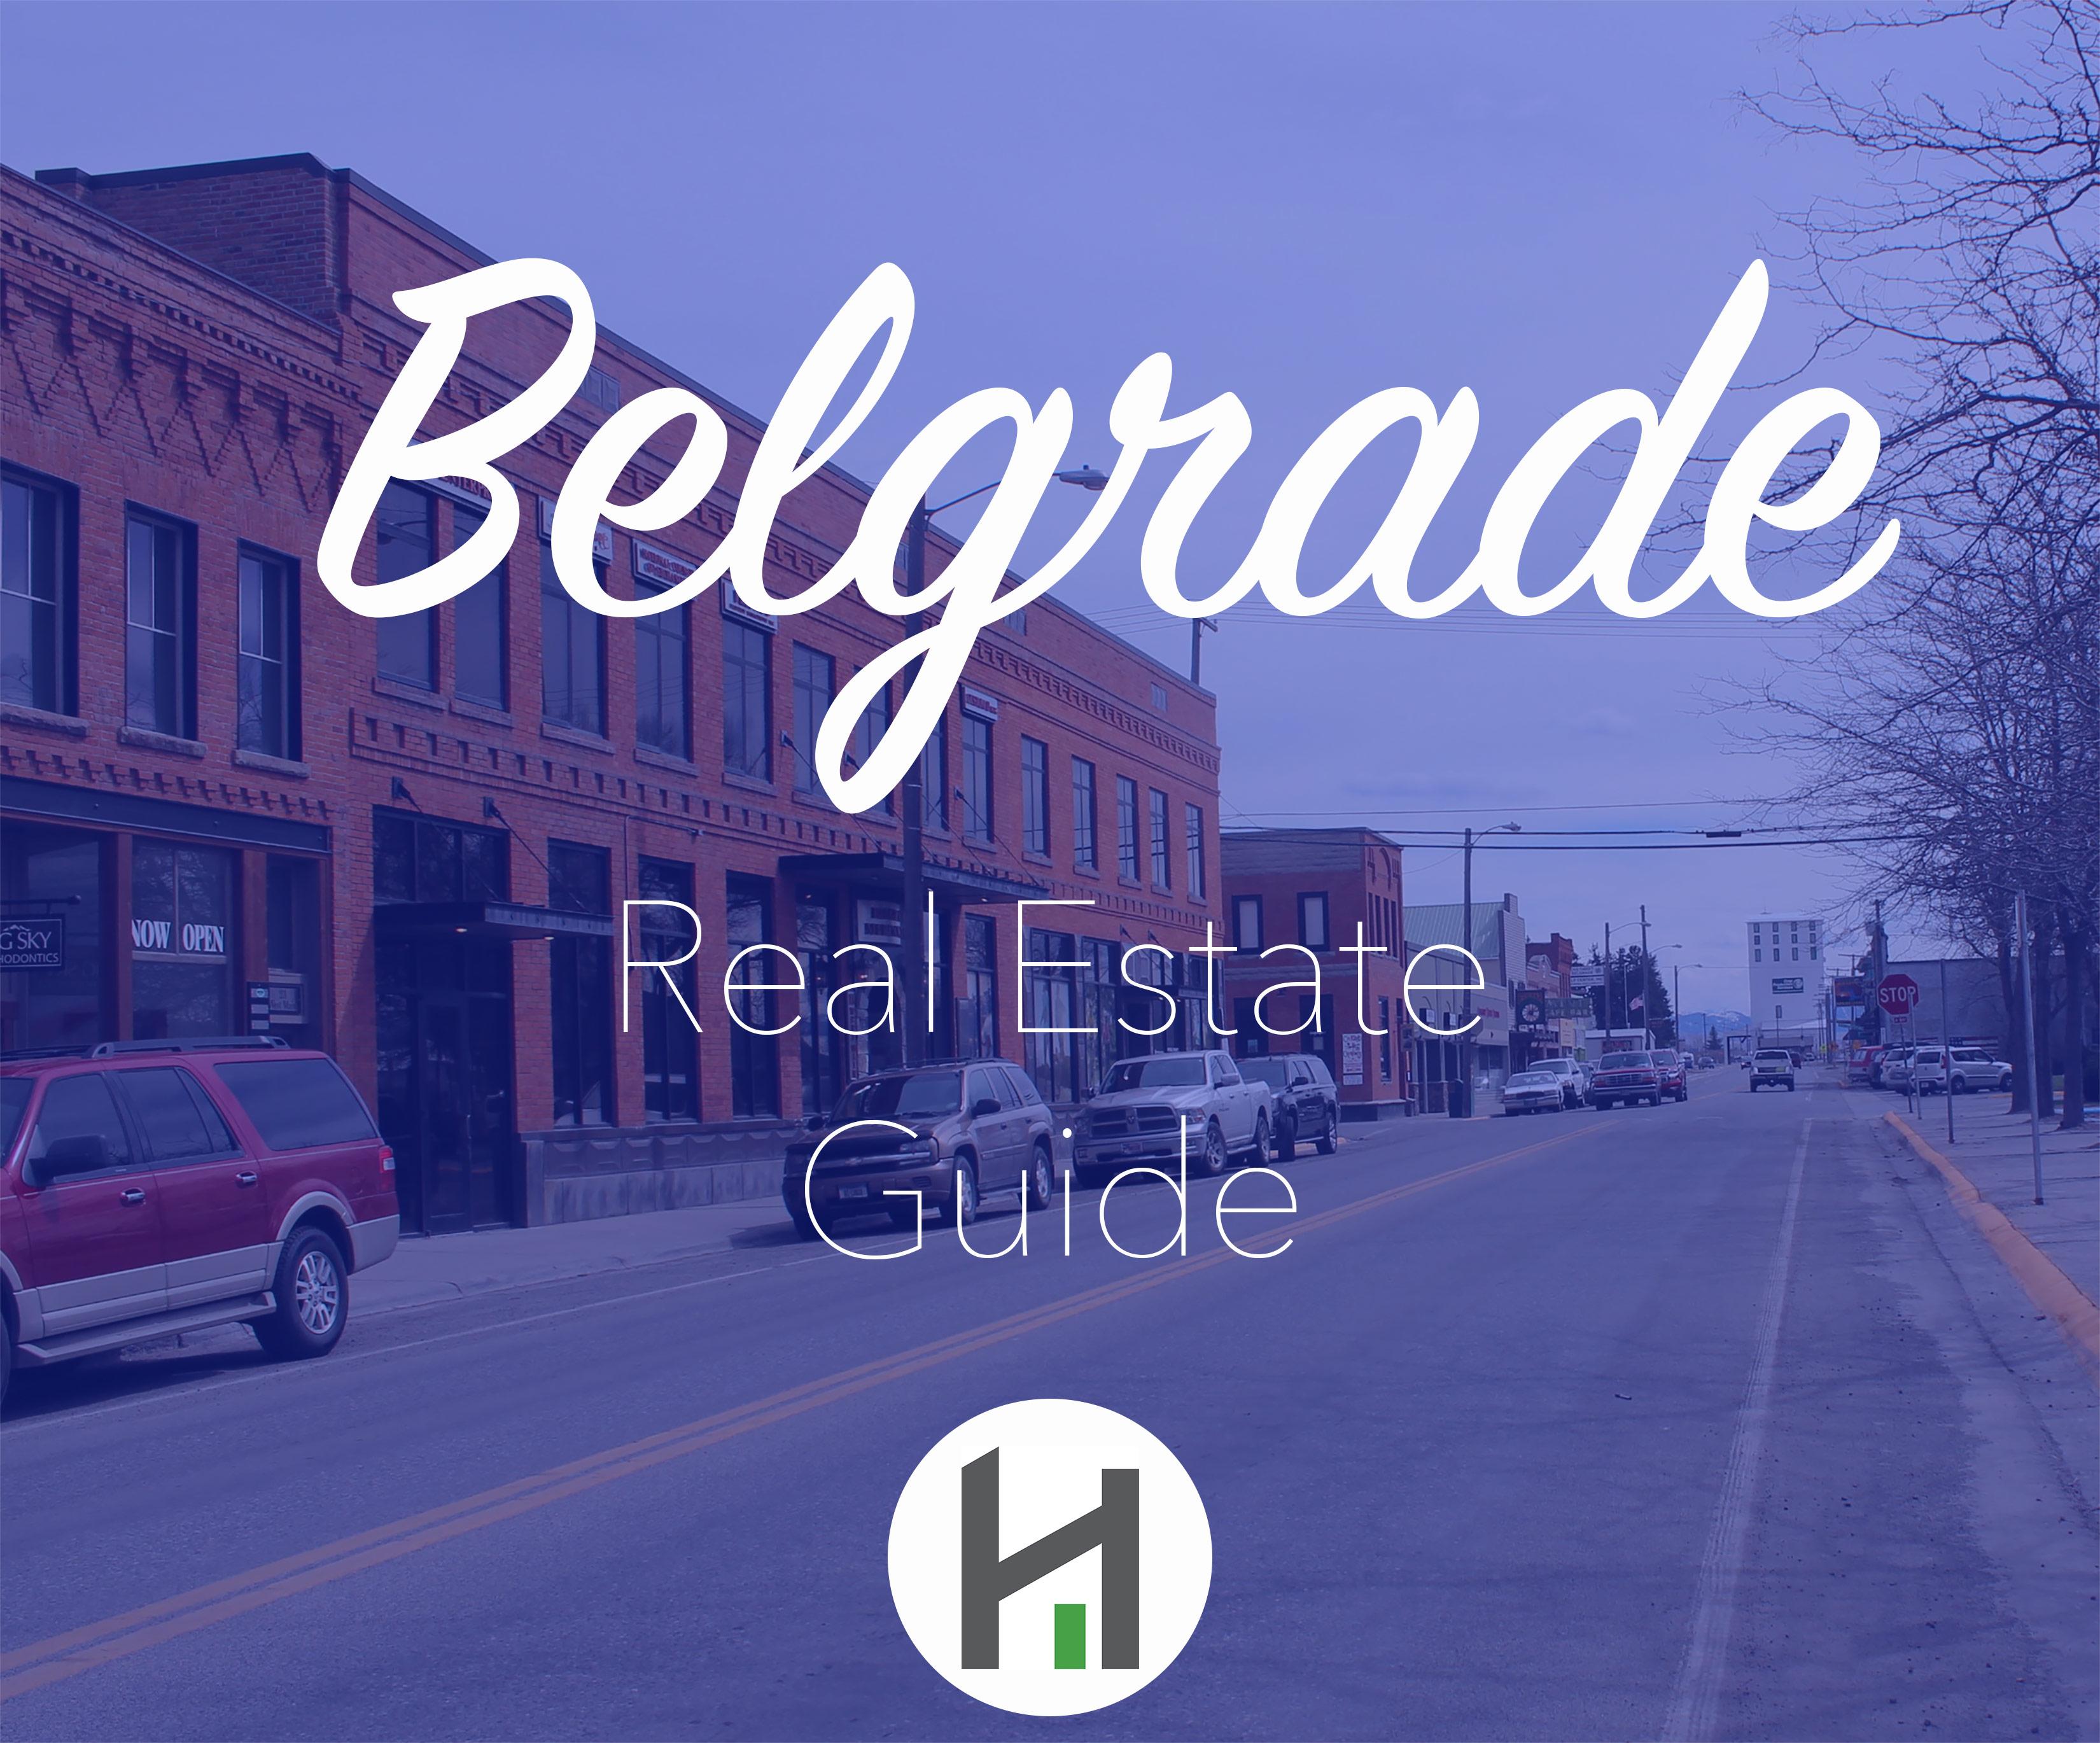 Belgrade Real Estate Guide